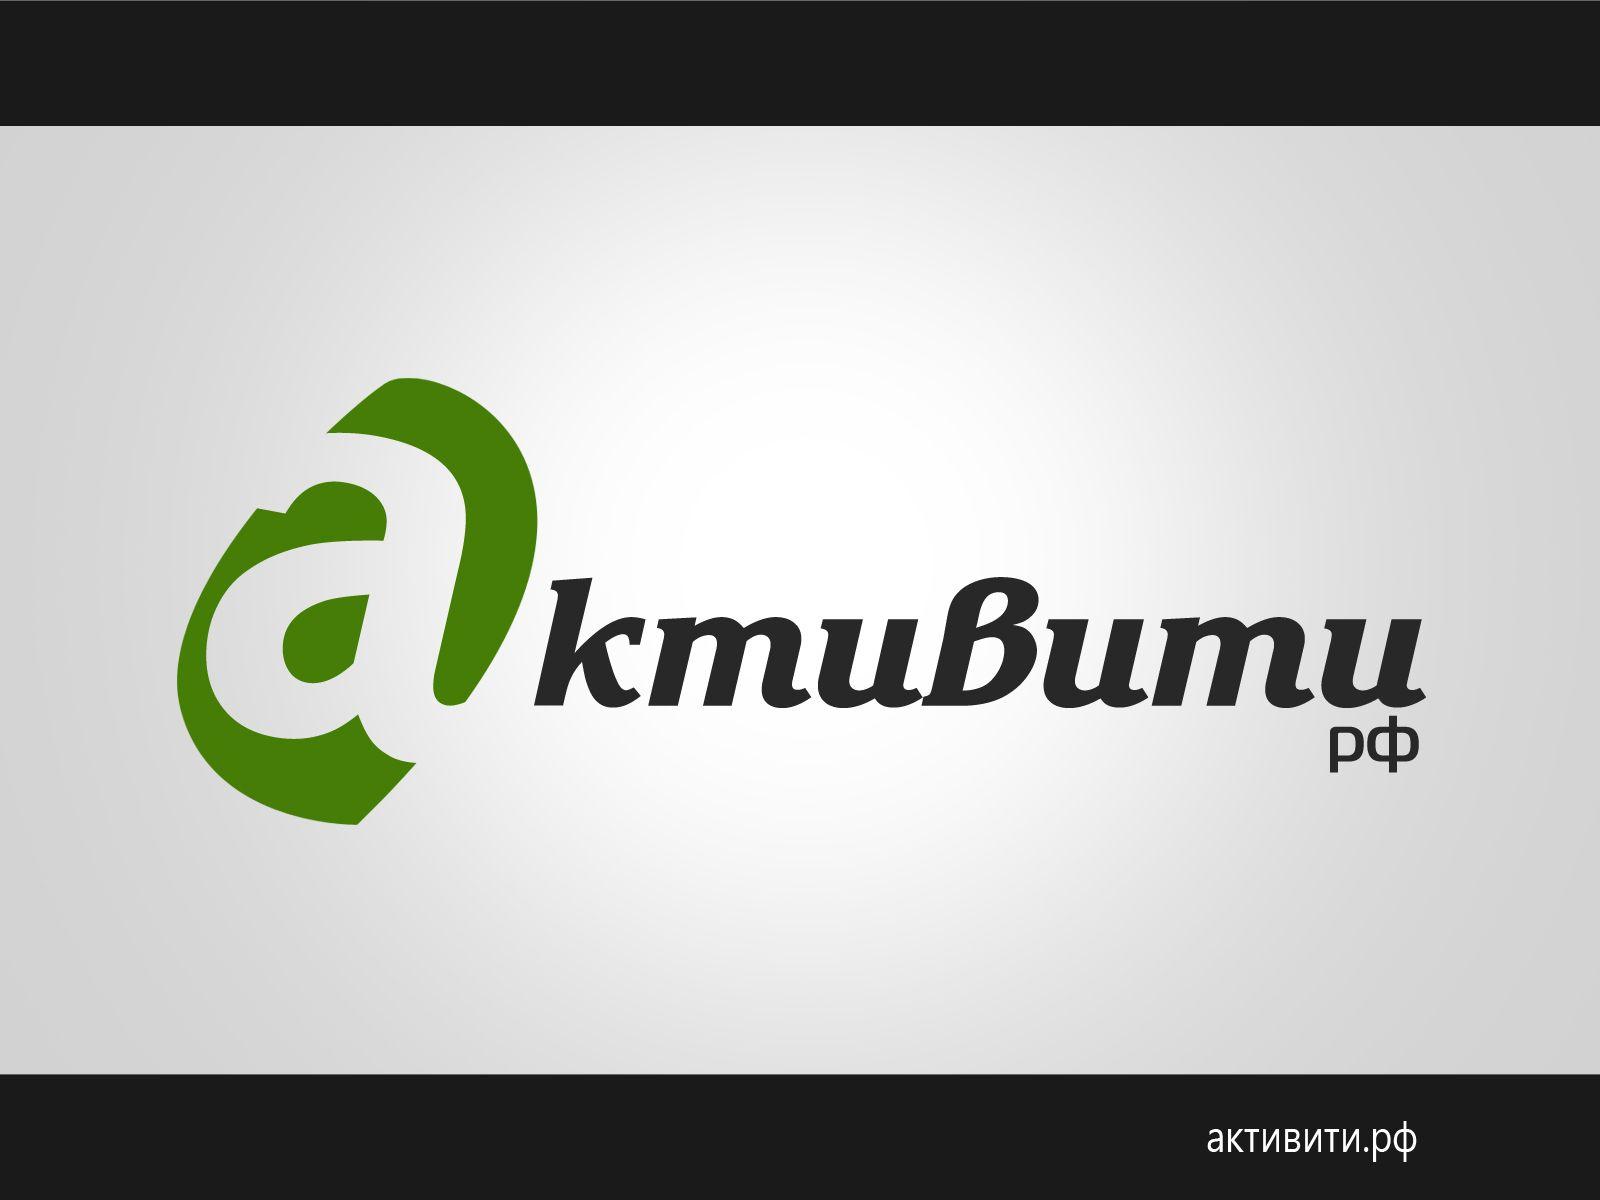 Логотип магазина активити.рф - дизайнер bonvian